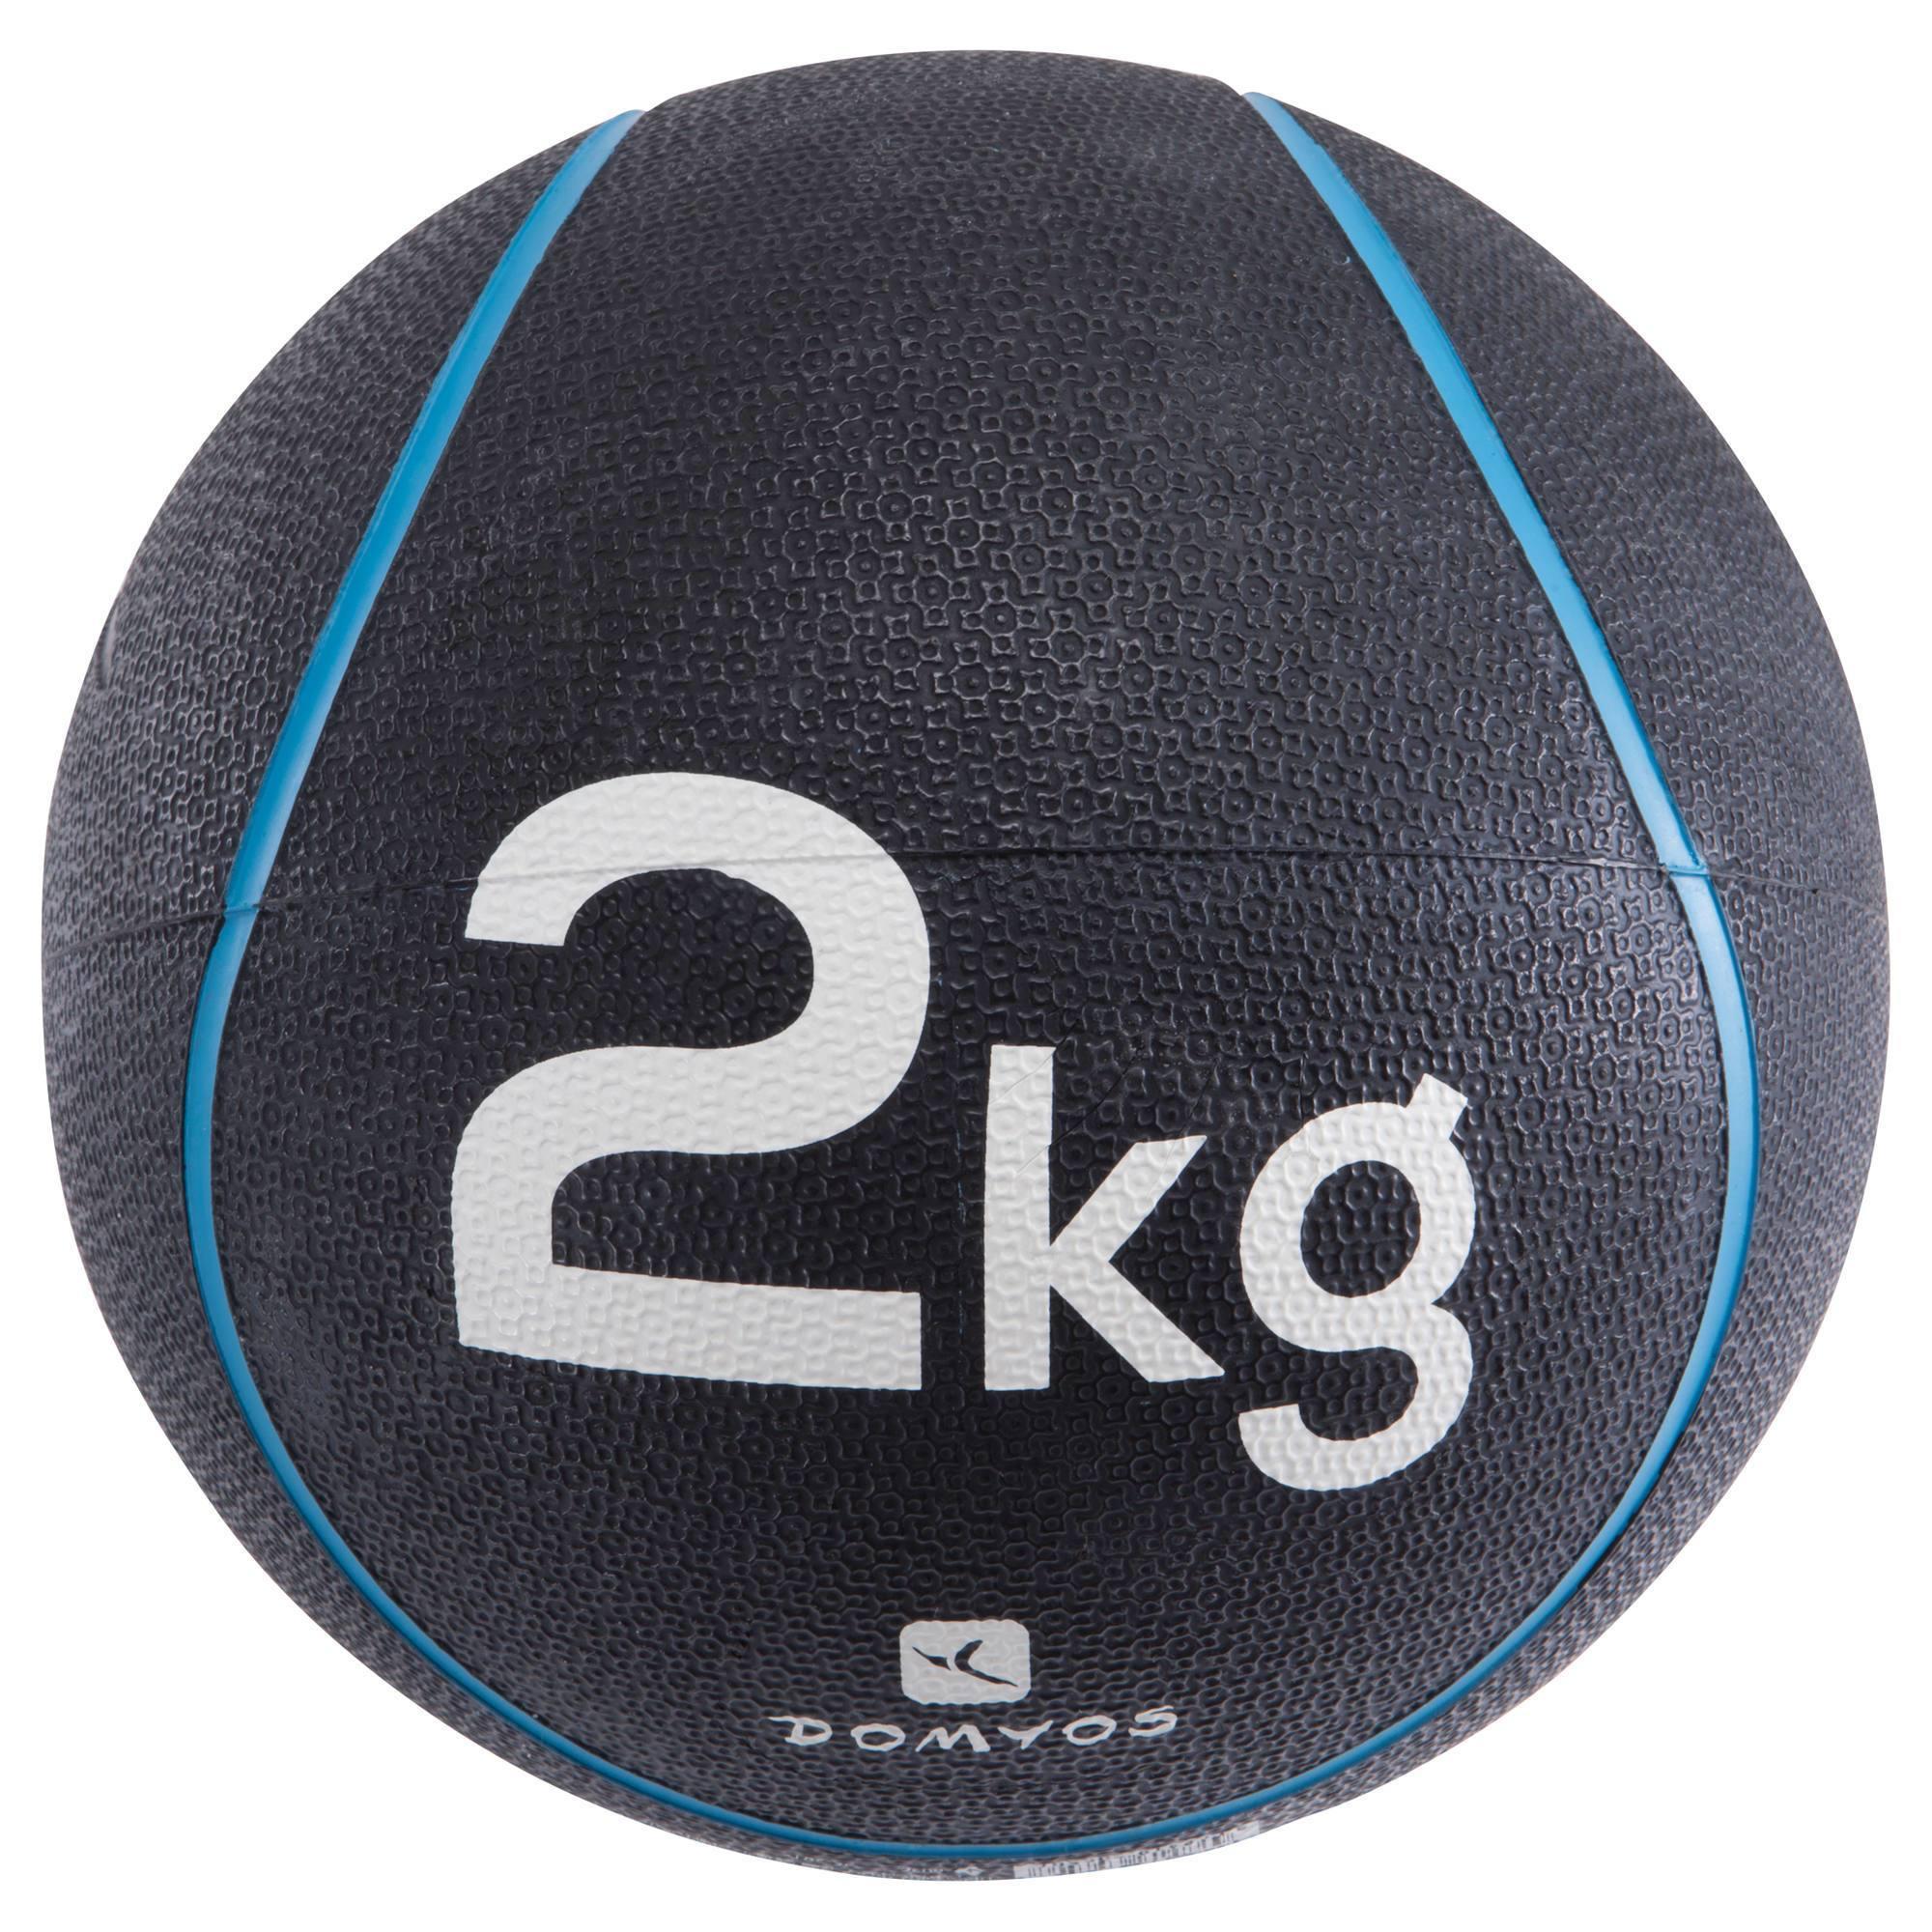 mdecine-ball-Nicoach-sport-fintess-perte-de-poids-metz